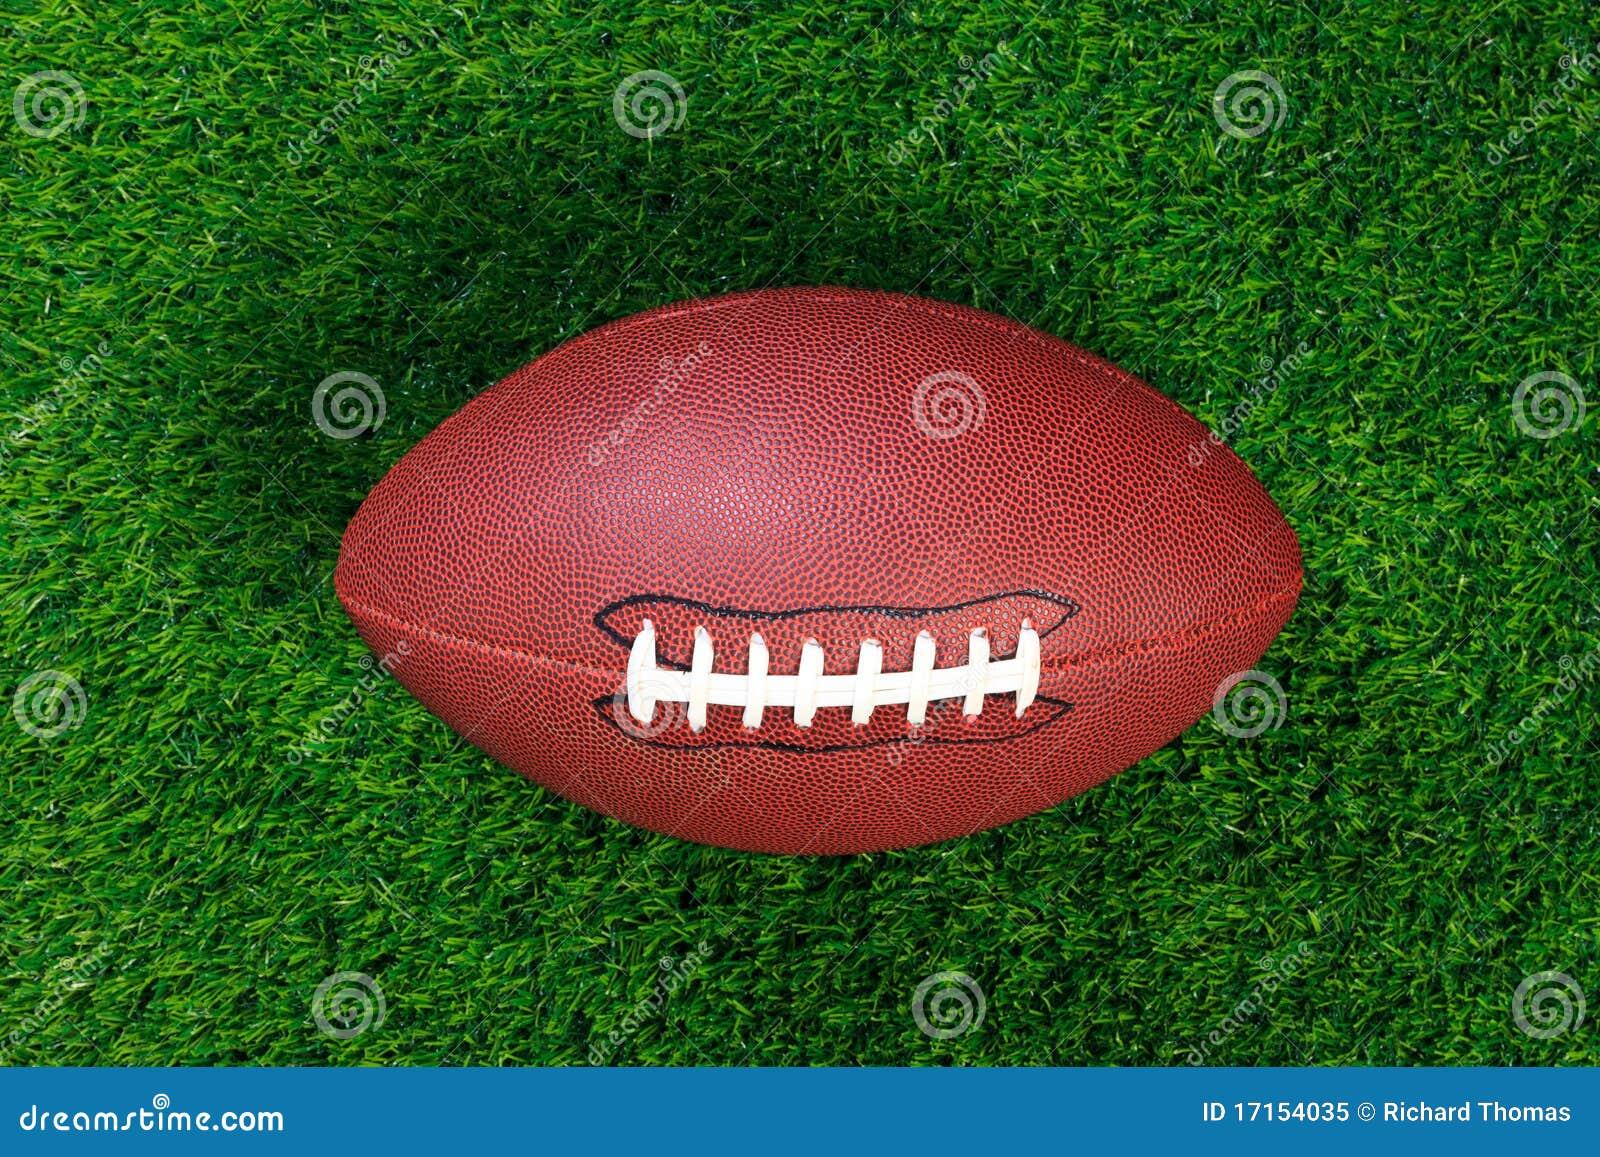 American football on grass